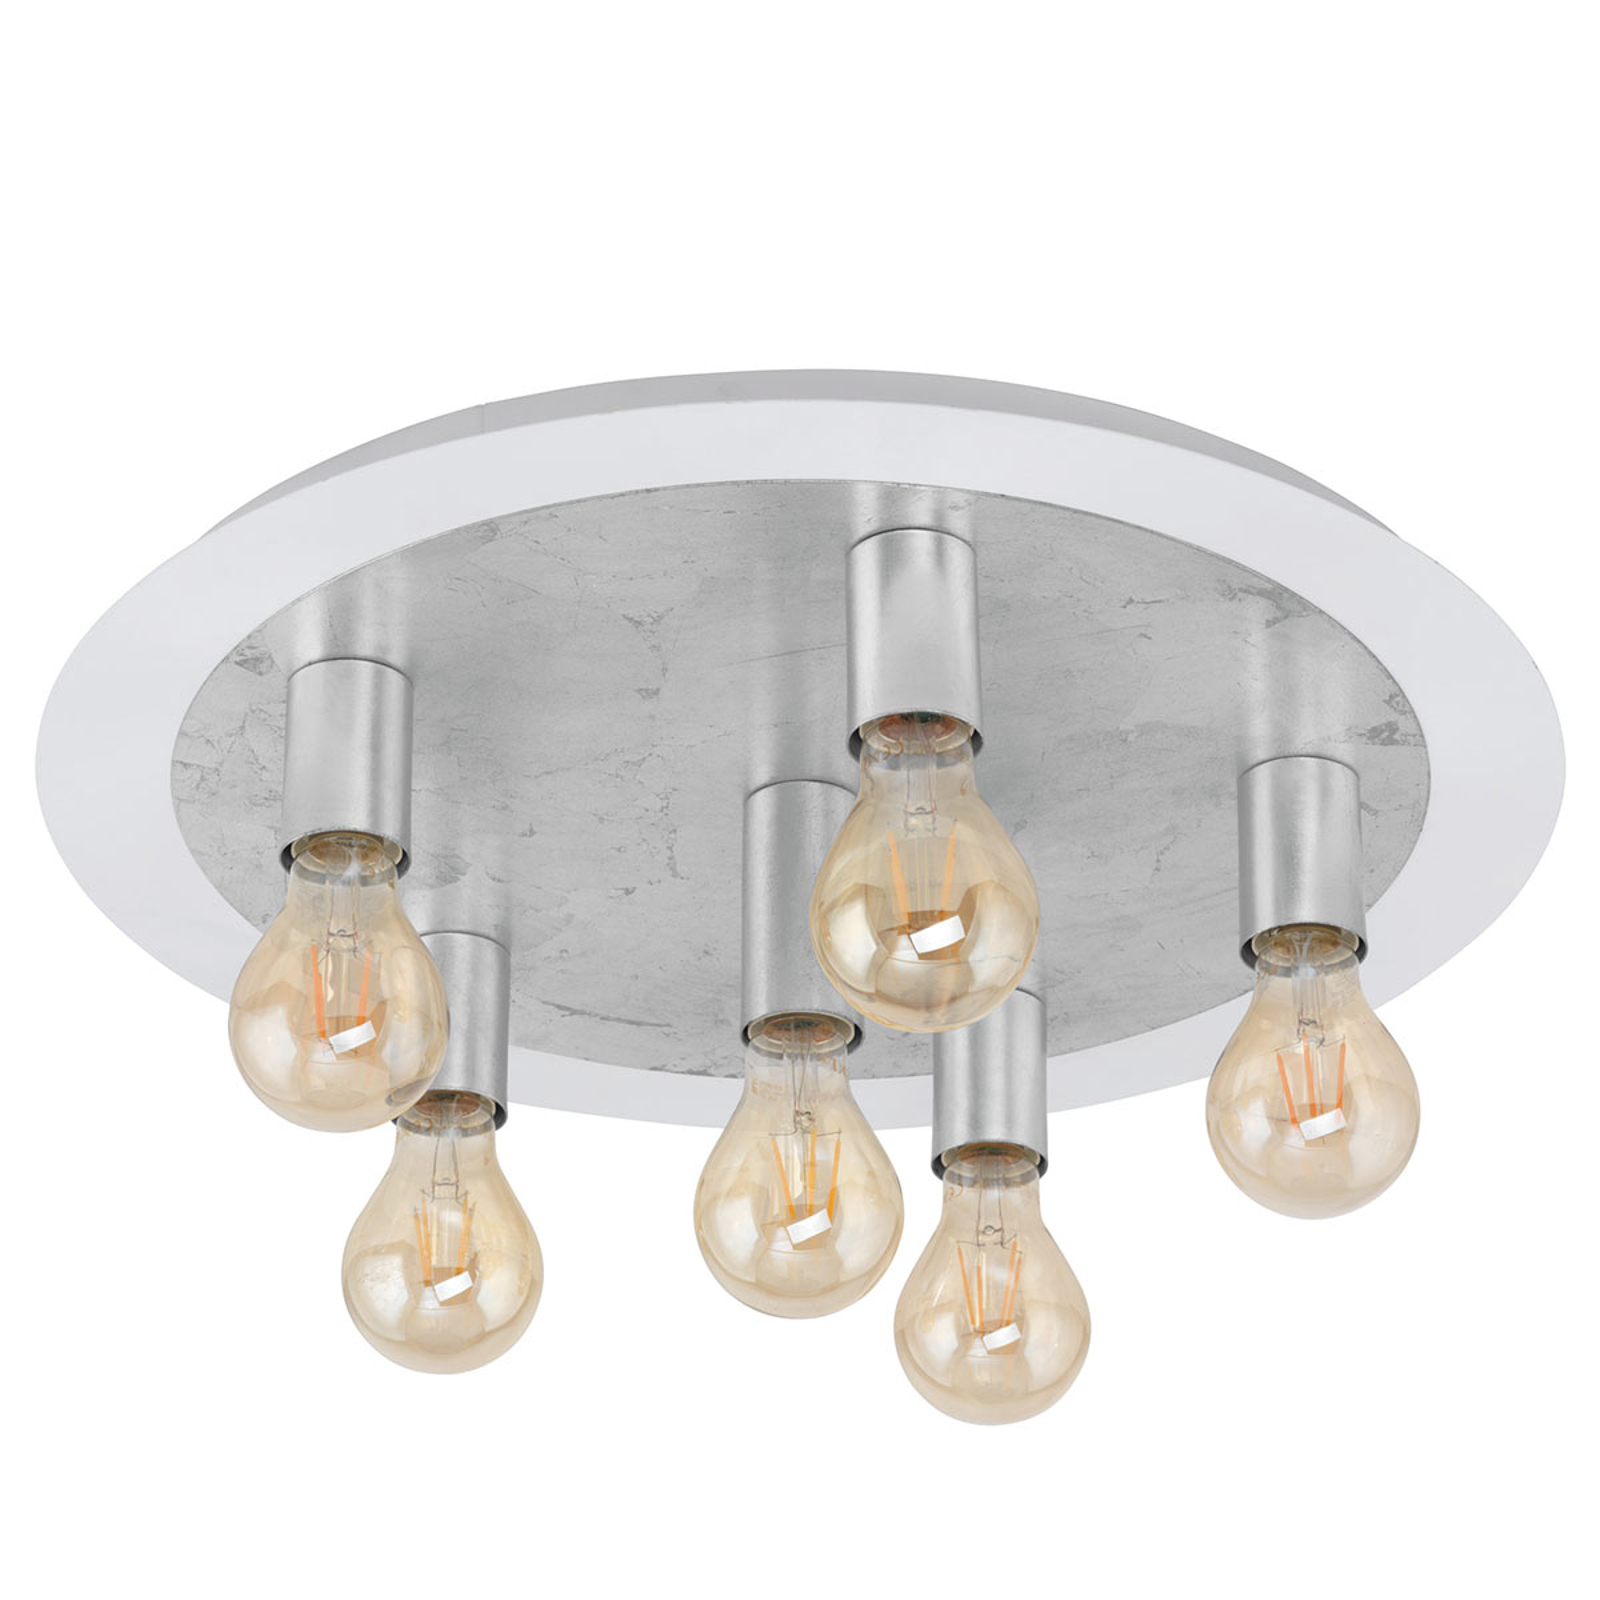 LED plafondlamp Passano 6-lamps zilver